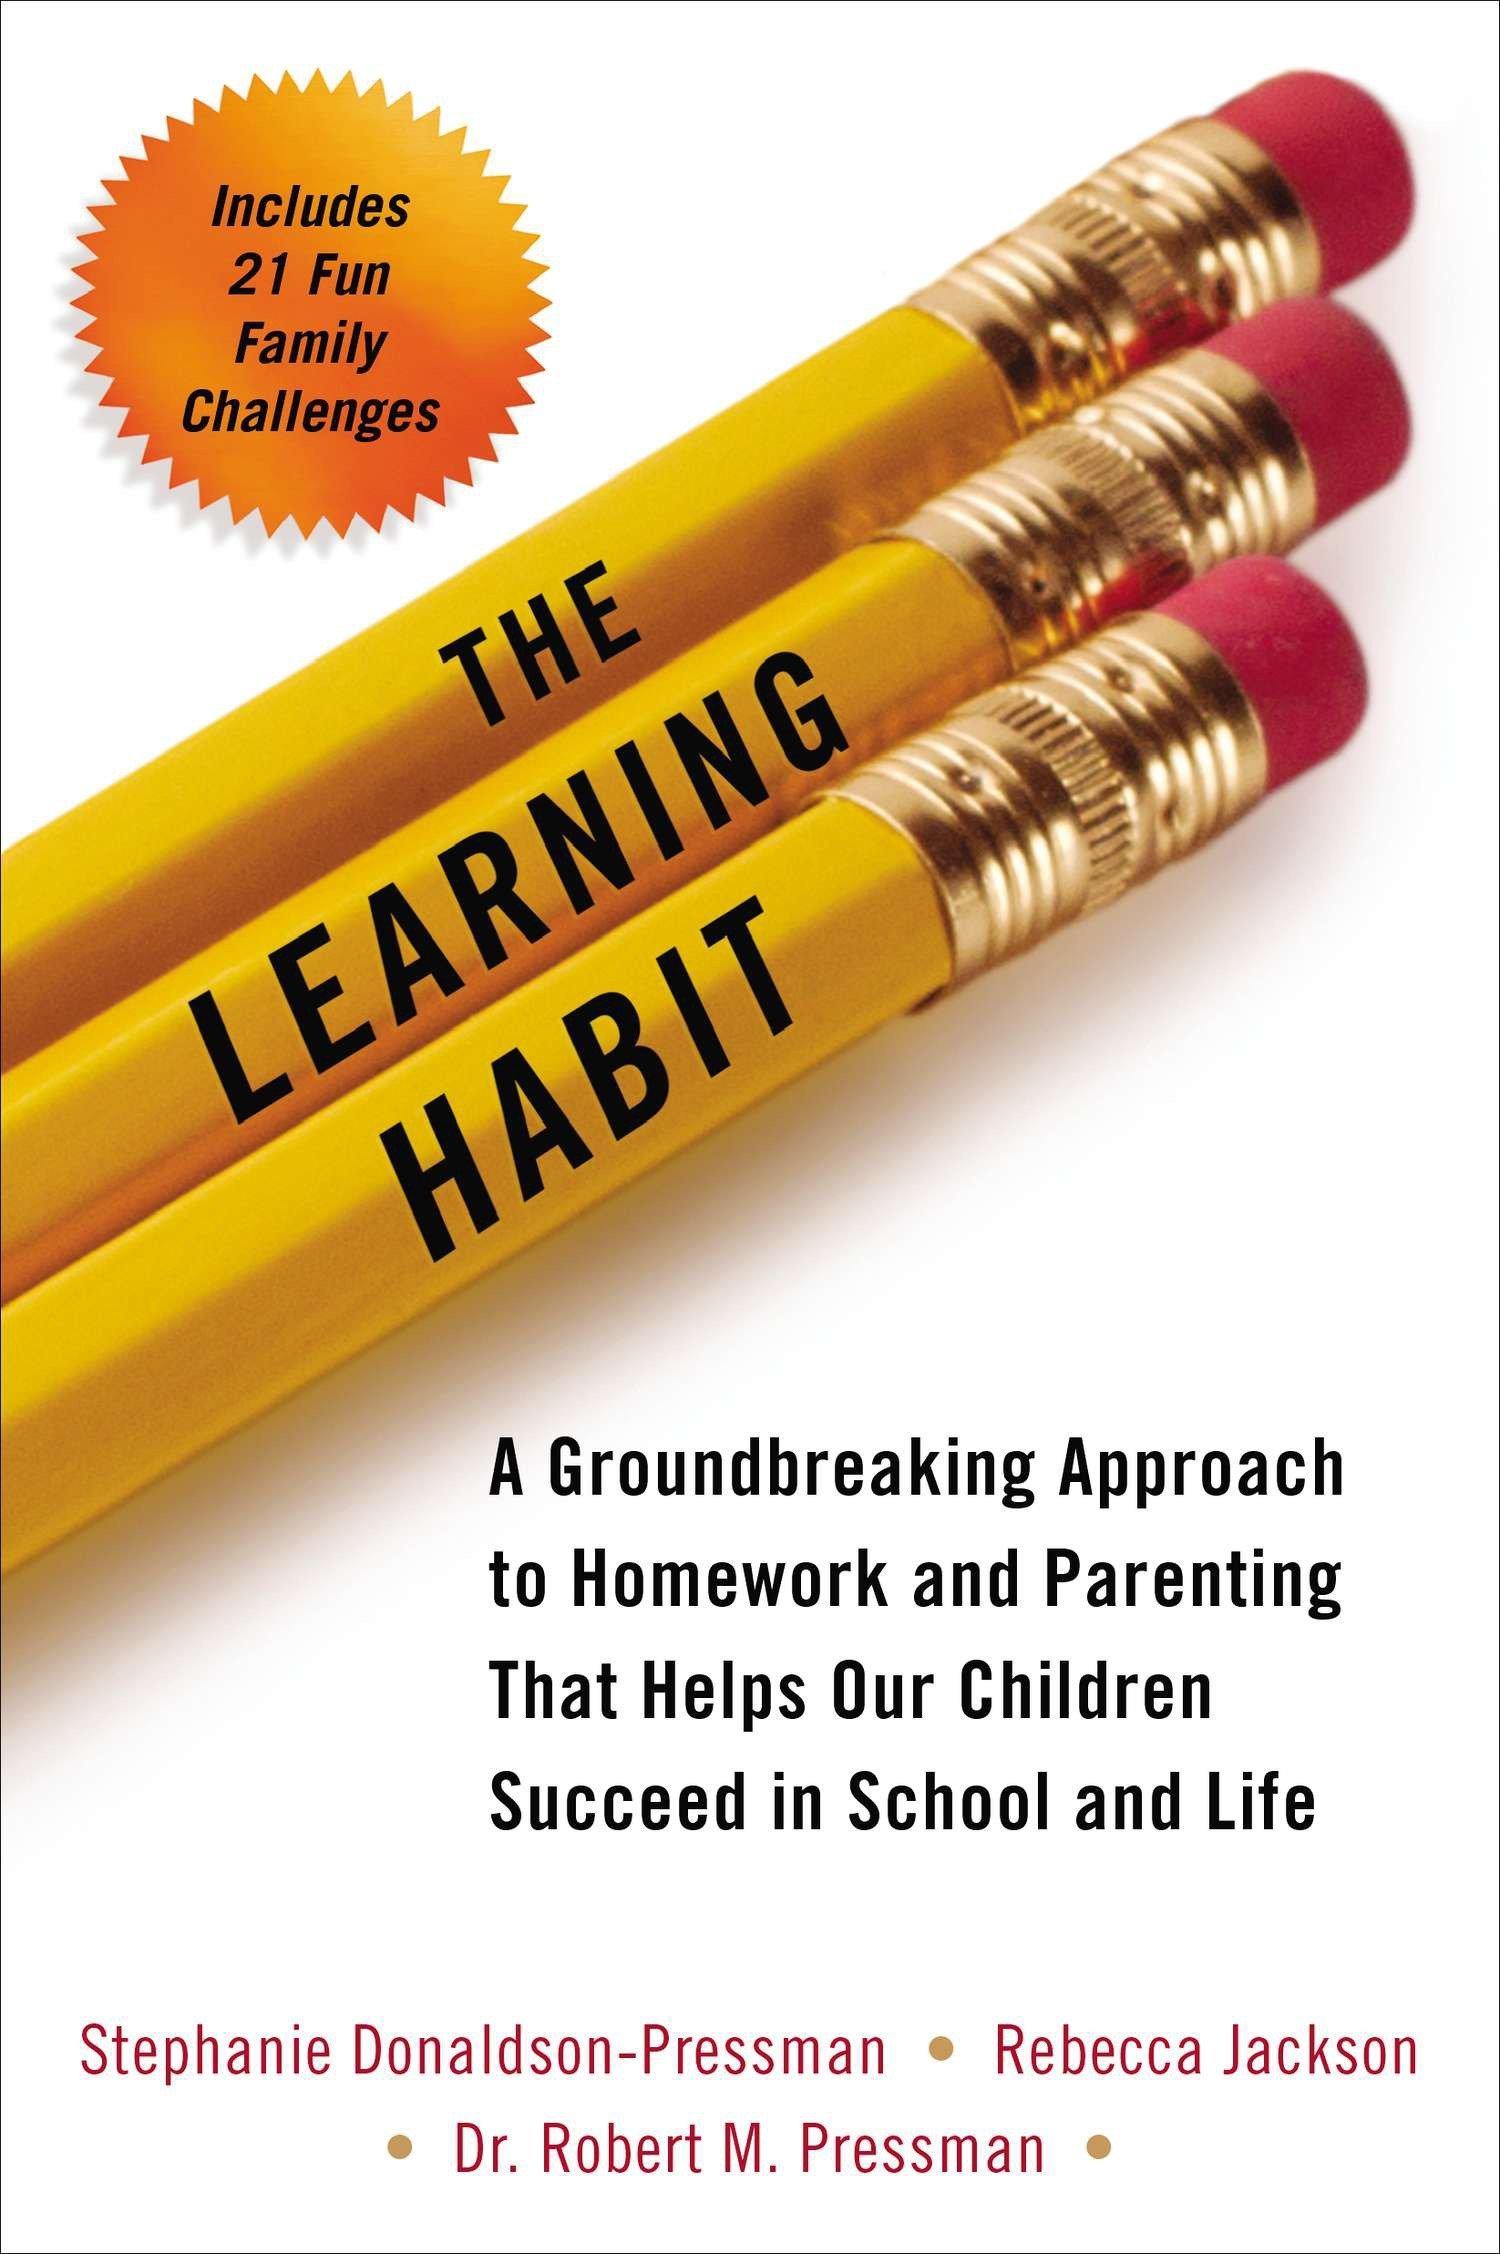 """The Learning Habit"" by Stephanie Donaldson-Pressman"